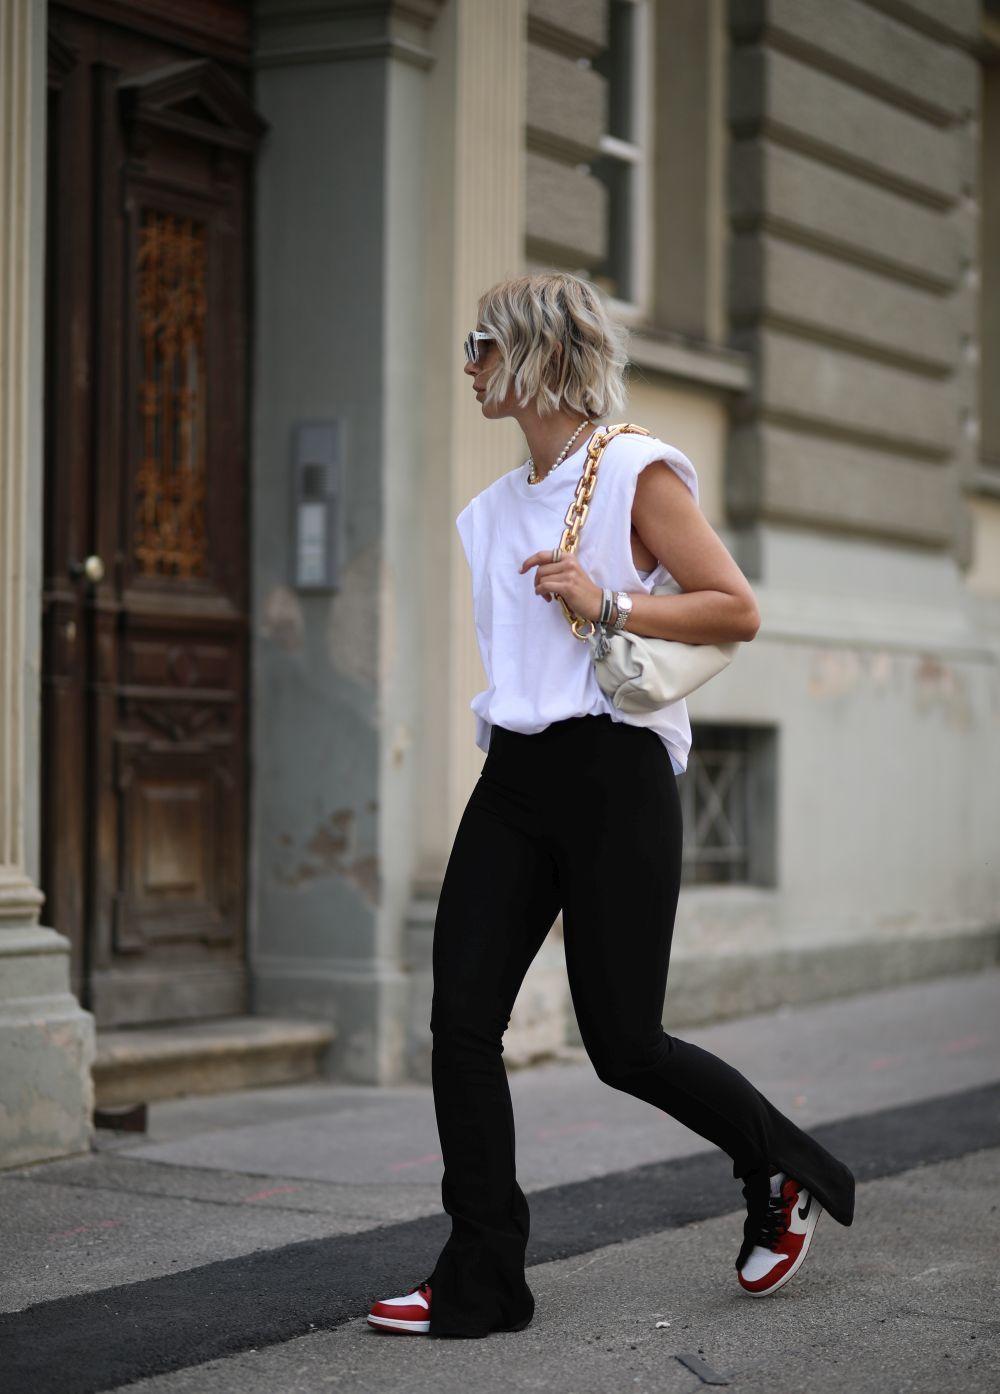 El street style se rinde a las Nike Jordan de estética vintage.